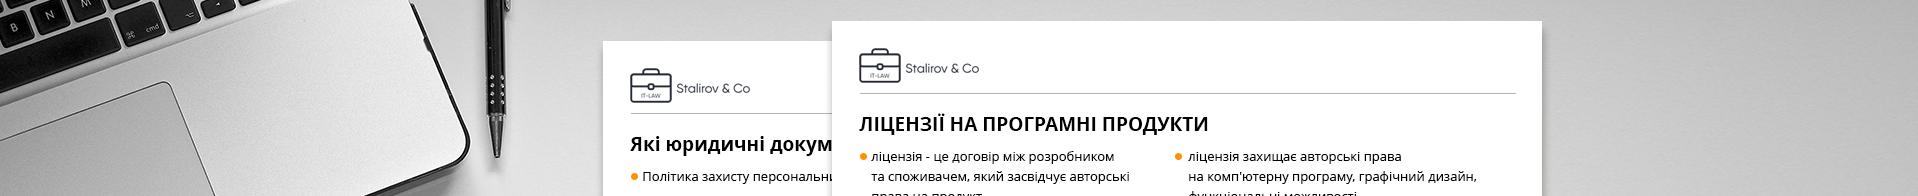 Ліцензія на ПЗ icon